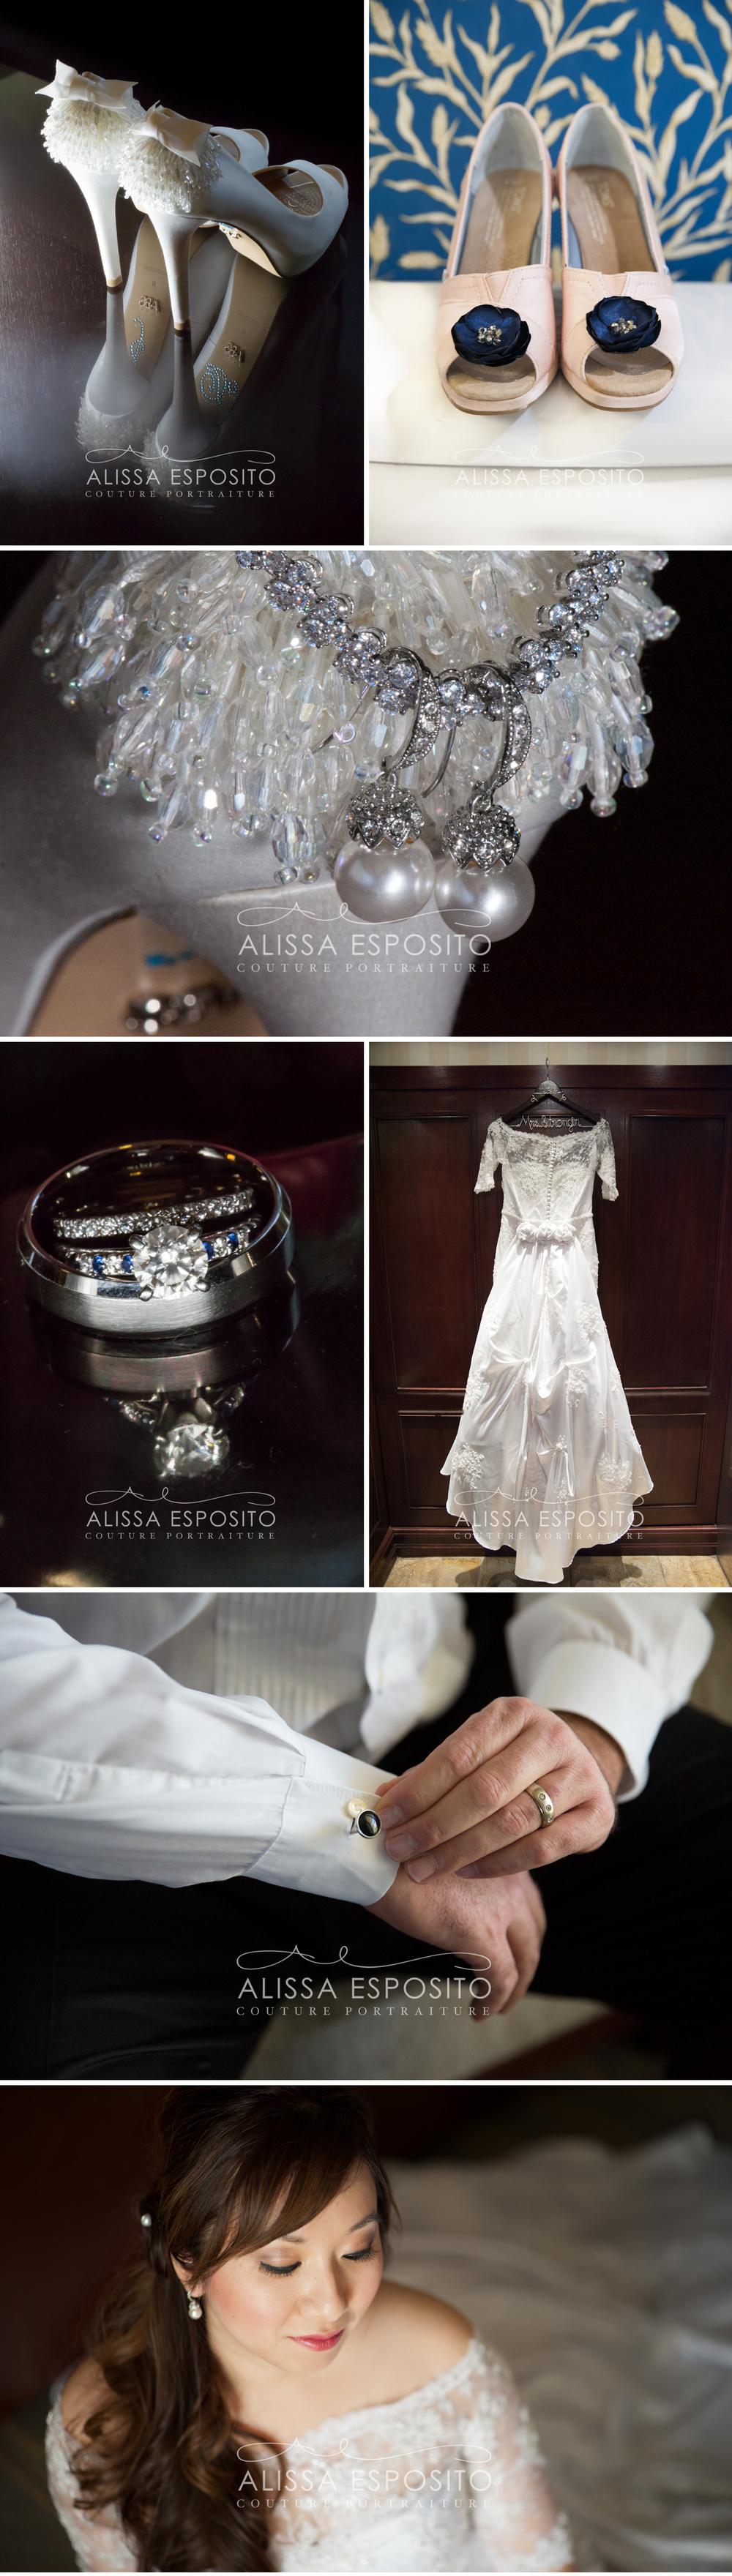 Southern California Wedding Photographer, Alissa Esposito Photography | www.alissaesposito.com